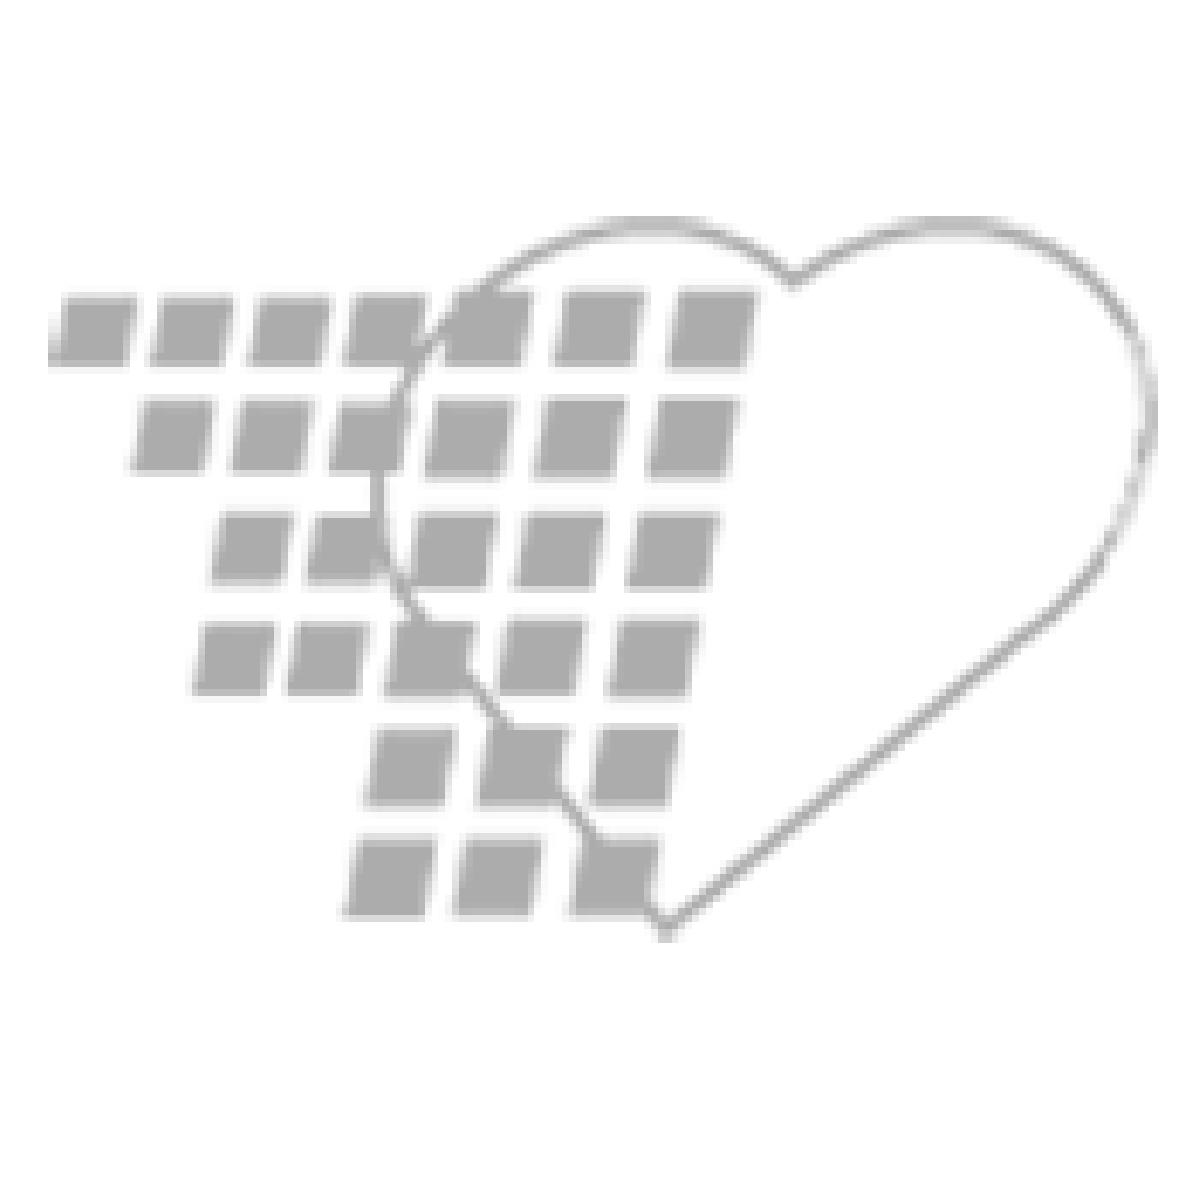 06-93-0420 - Demo Dose® Dextros 10%  1000mL